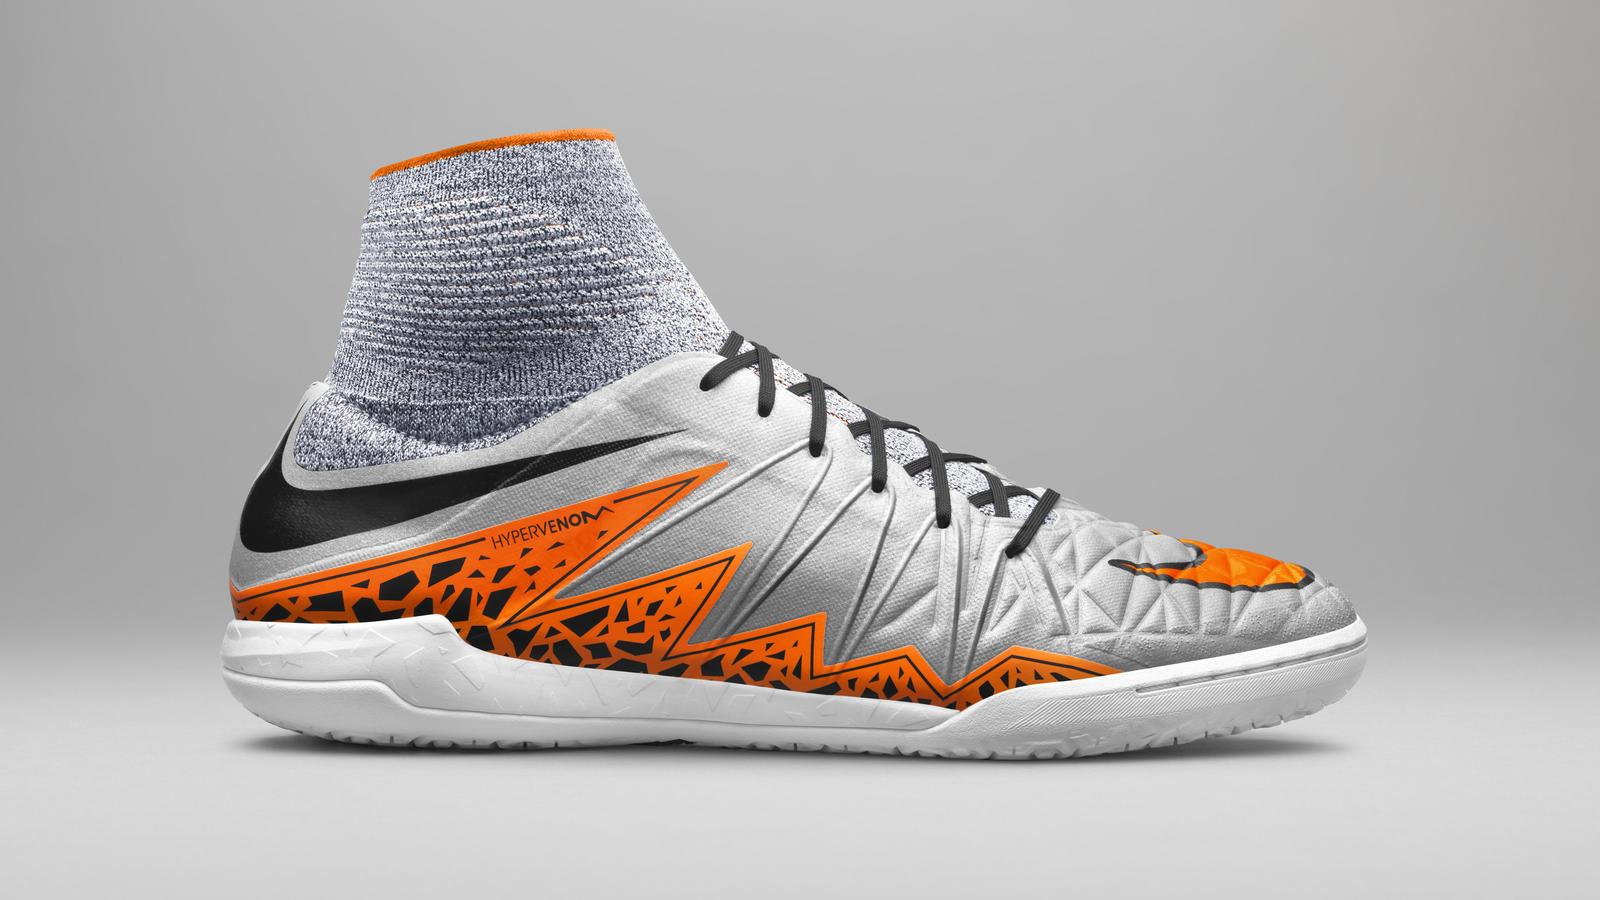 Nike leadership